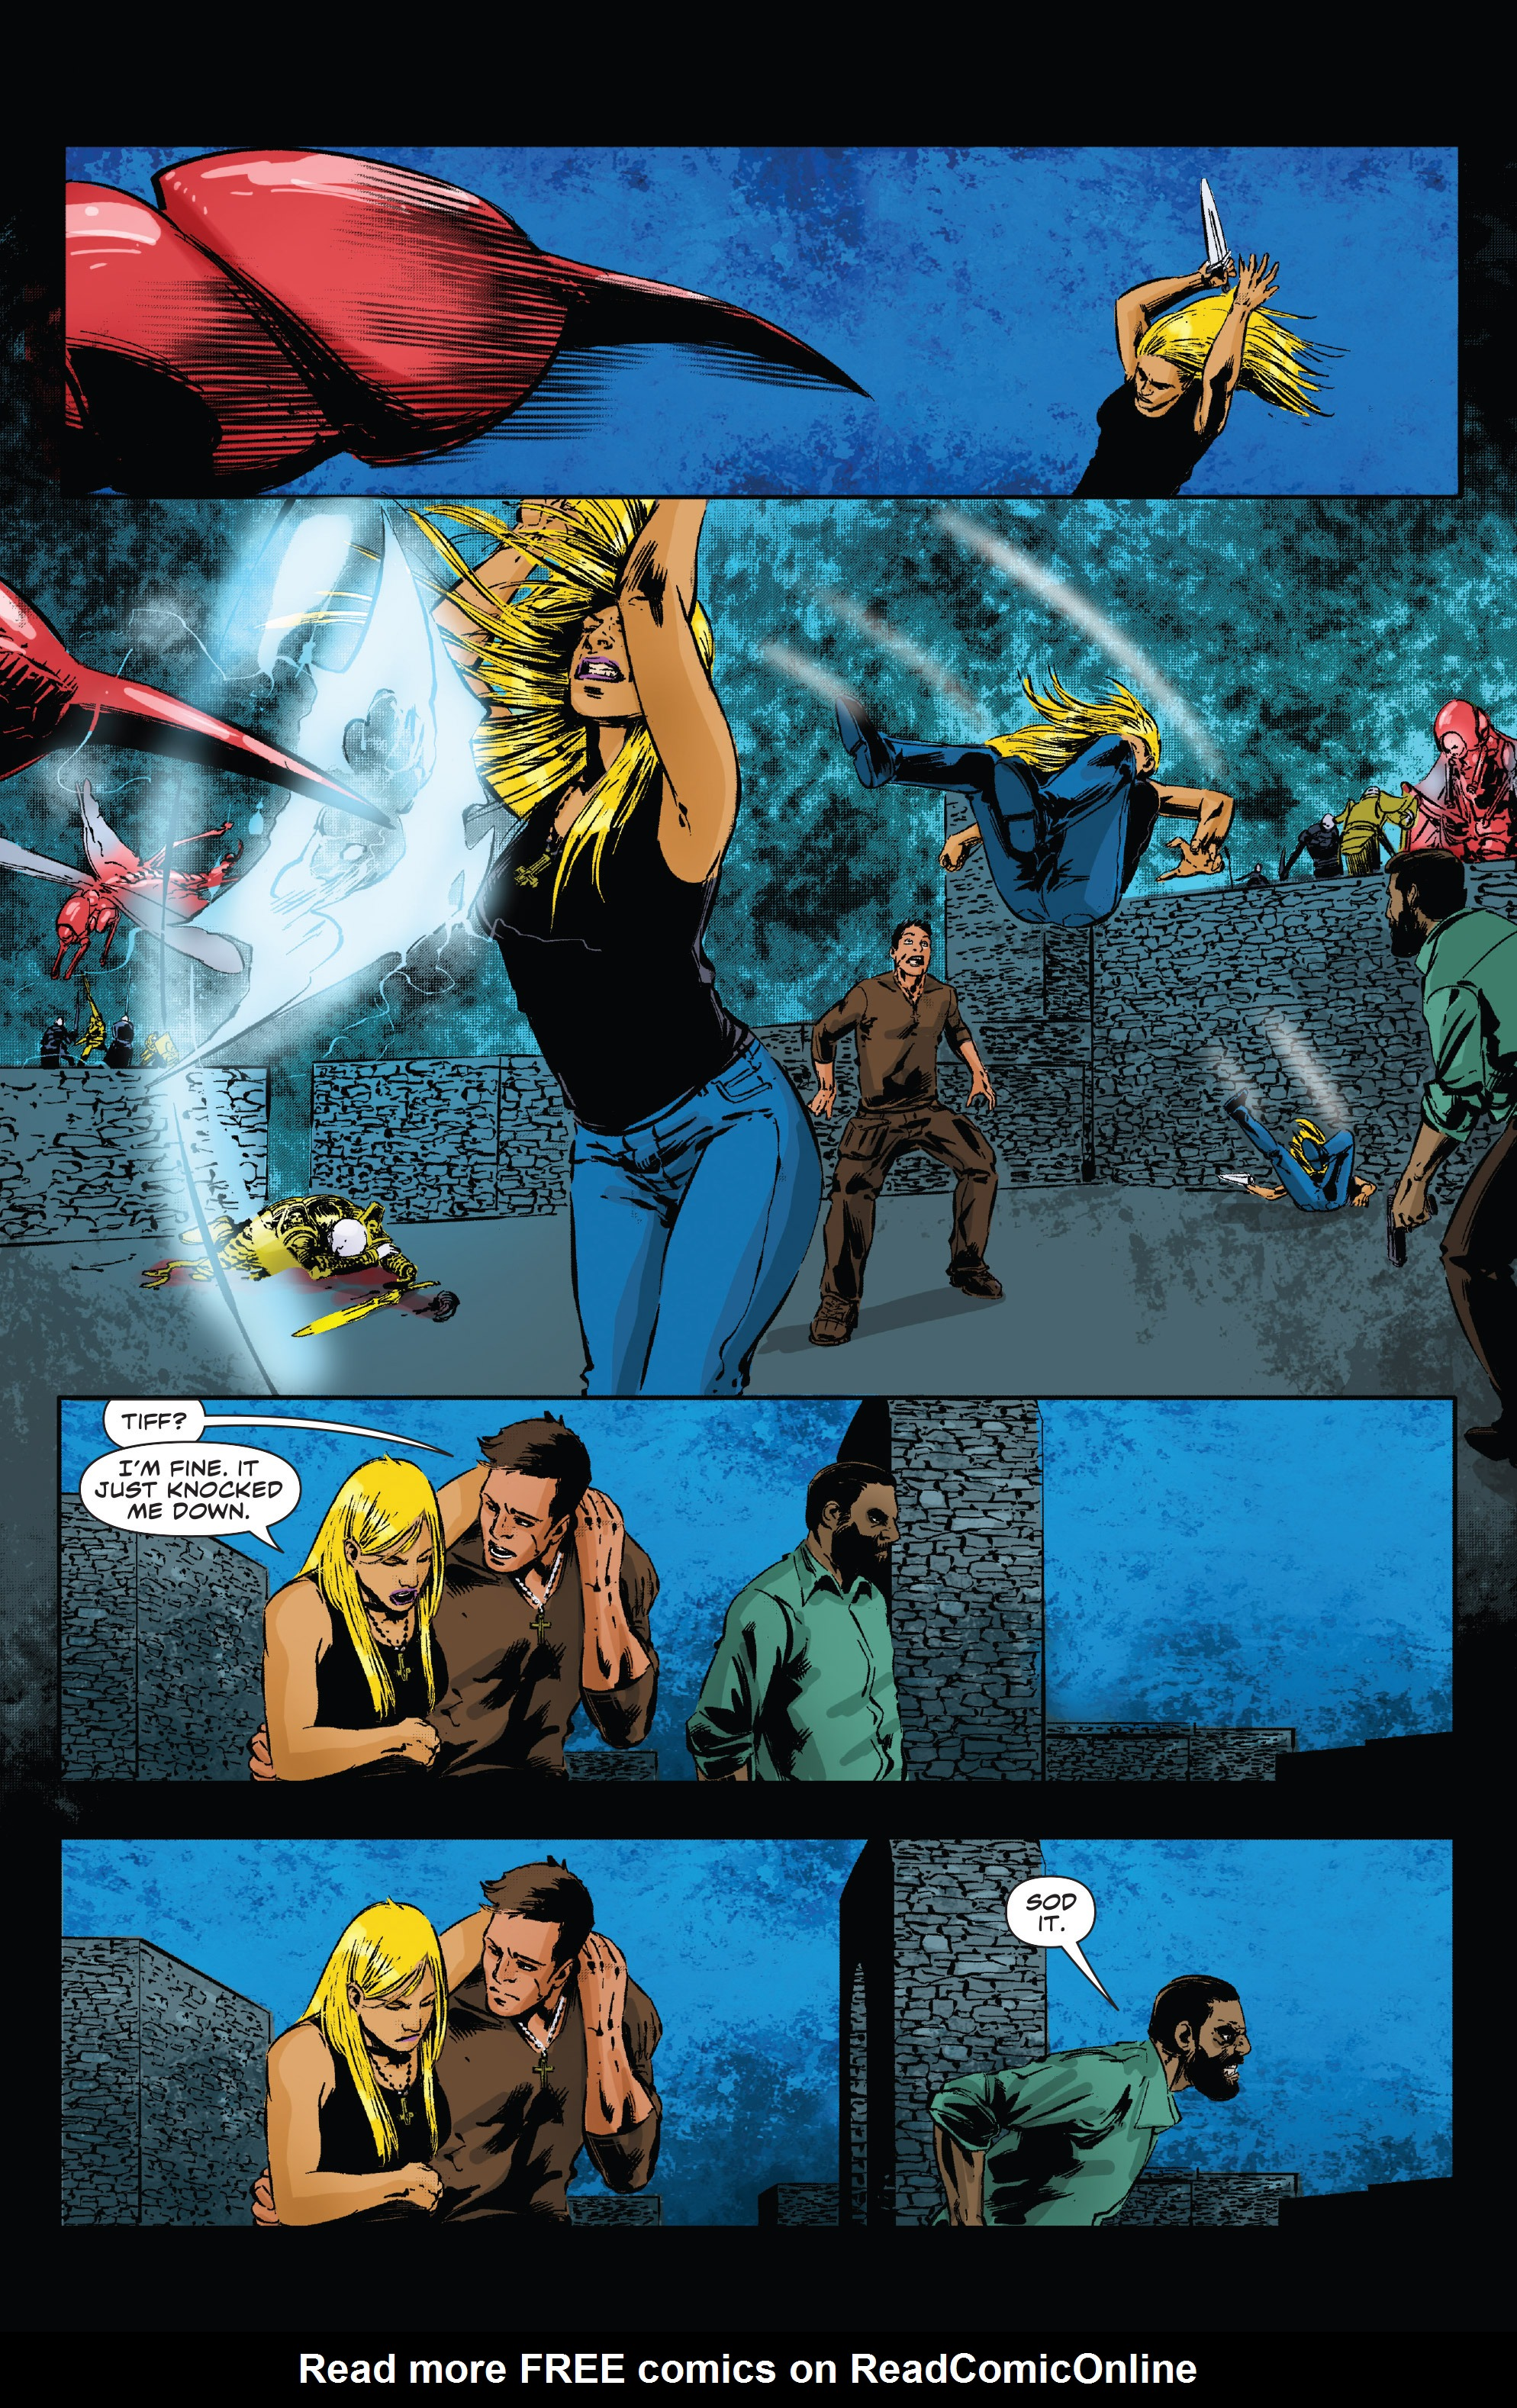 Read online Clive Barker's Hellraiser: The Dark Watch comic -  Issue # TPB 3 - 50